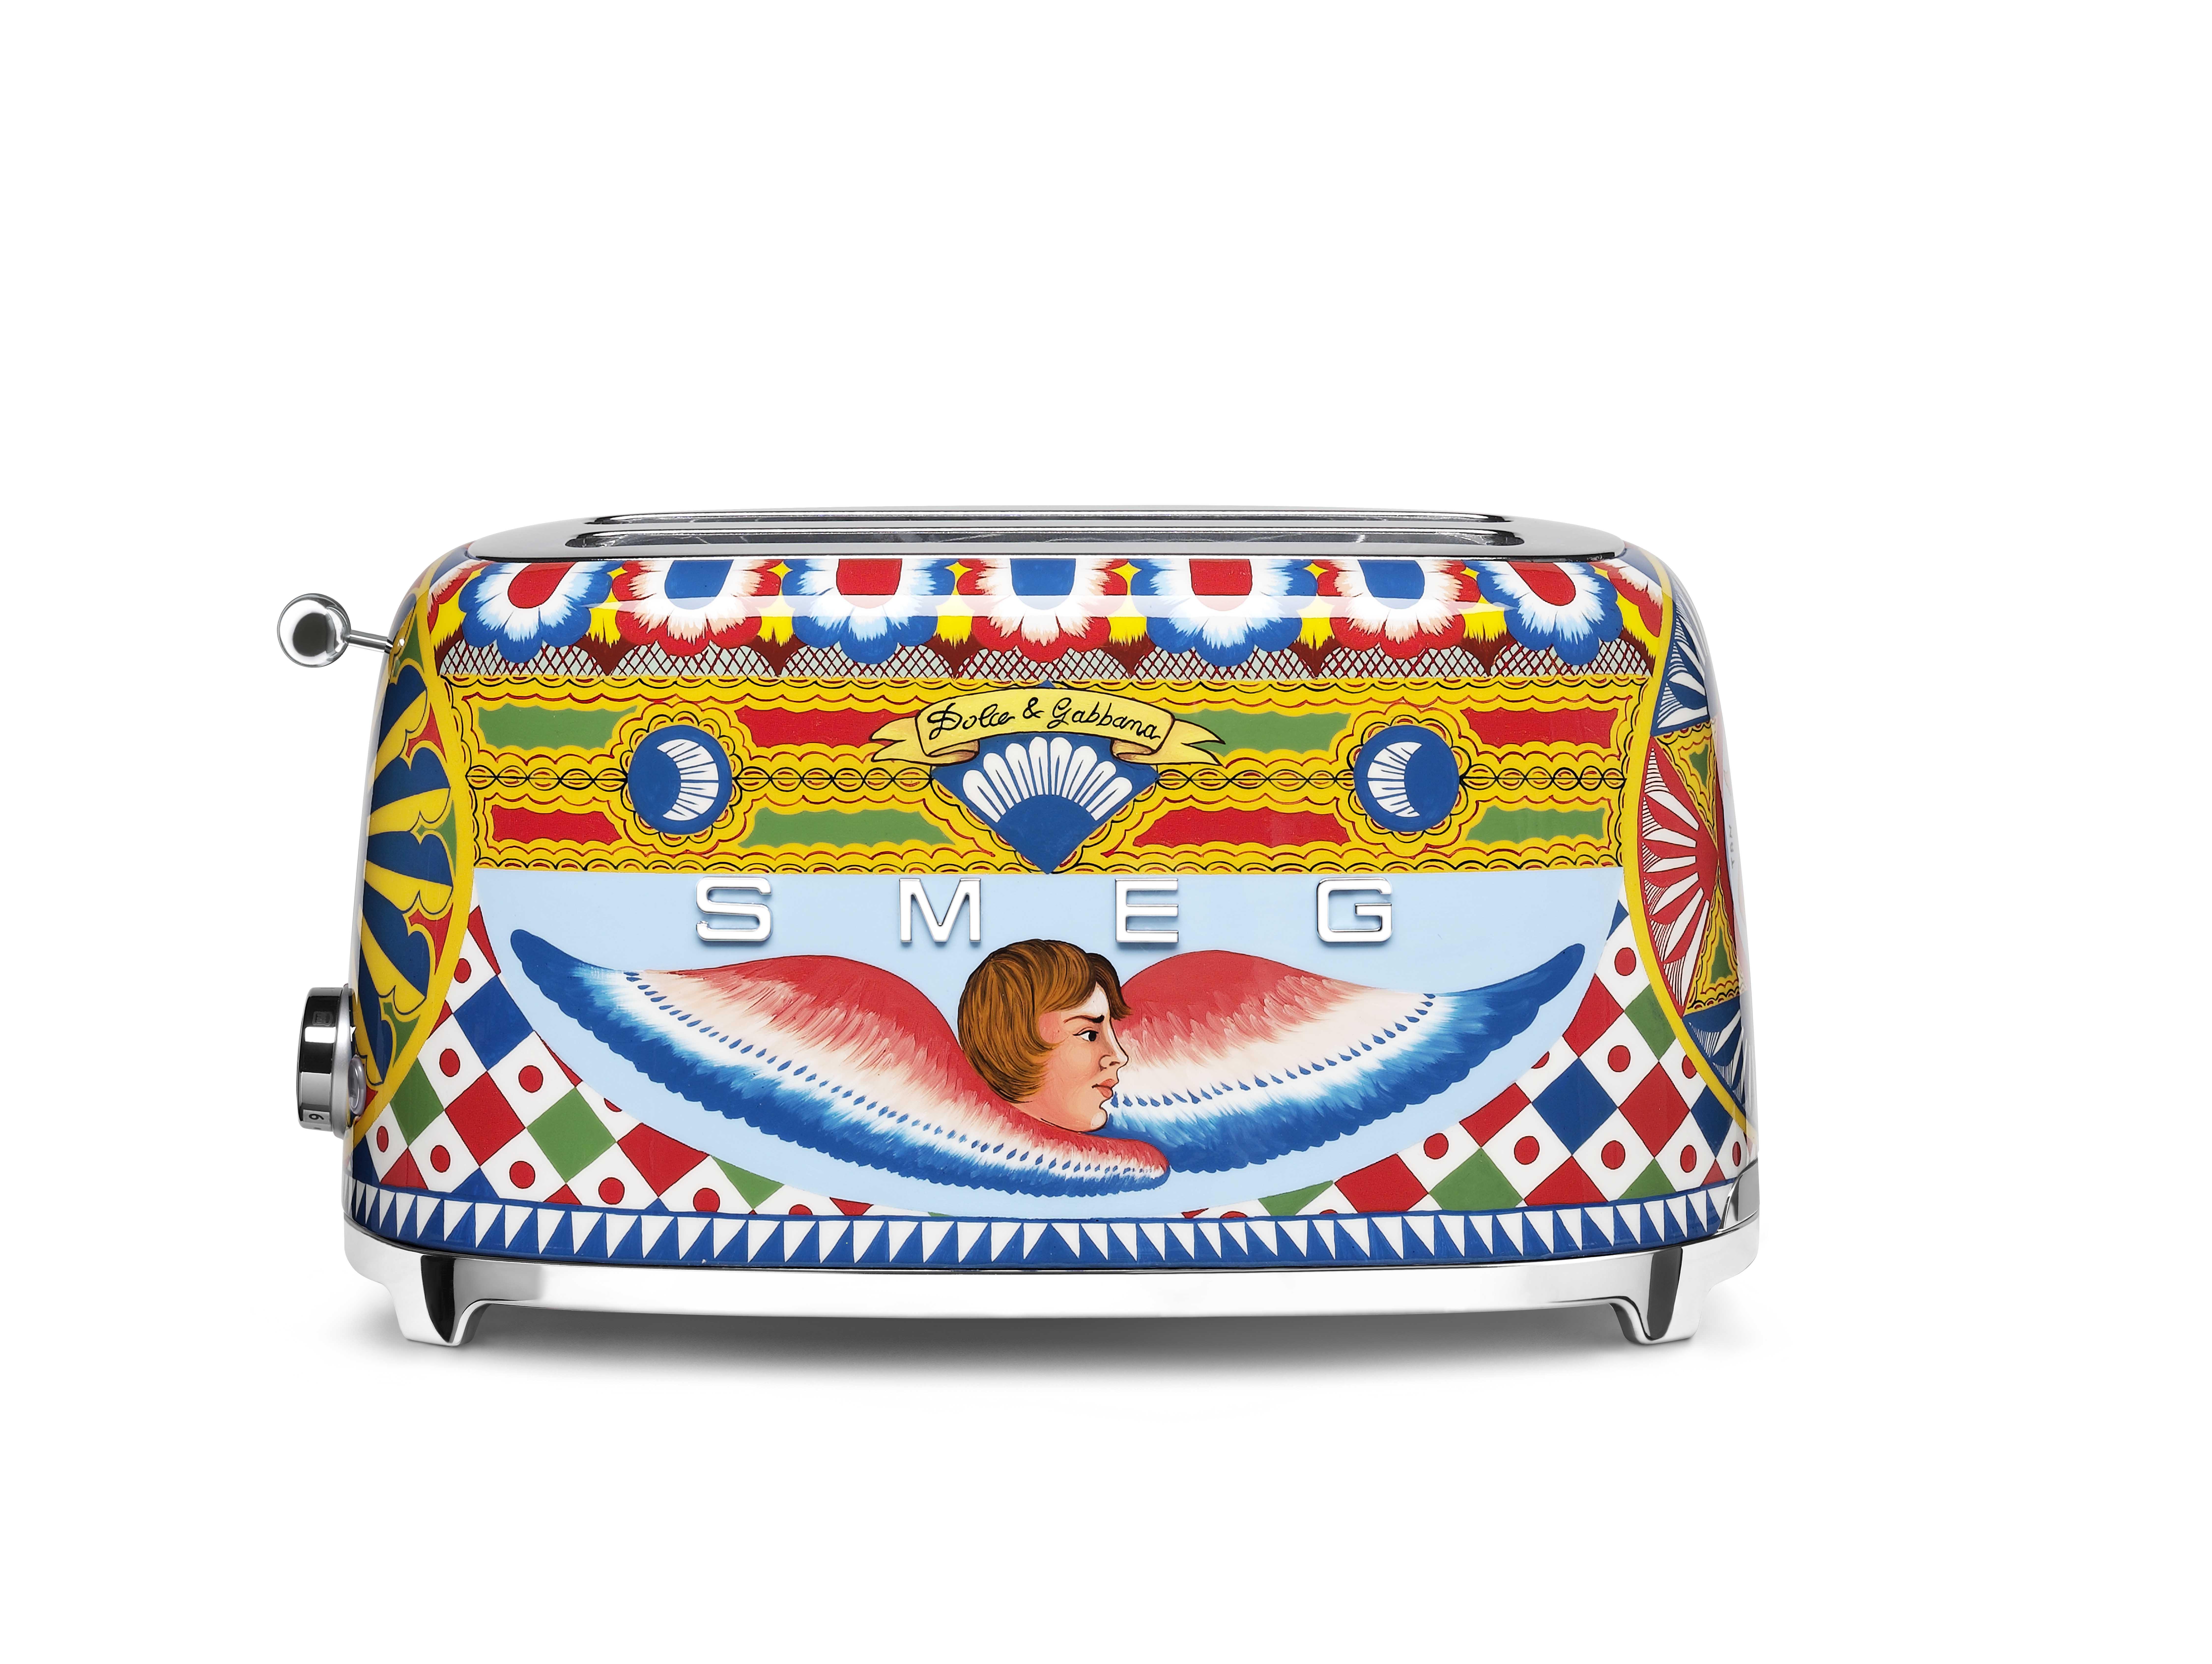 Dolce&Gabbana e Smeg: \